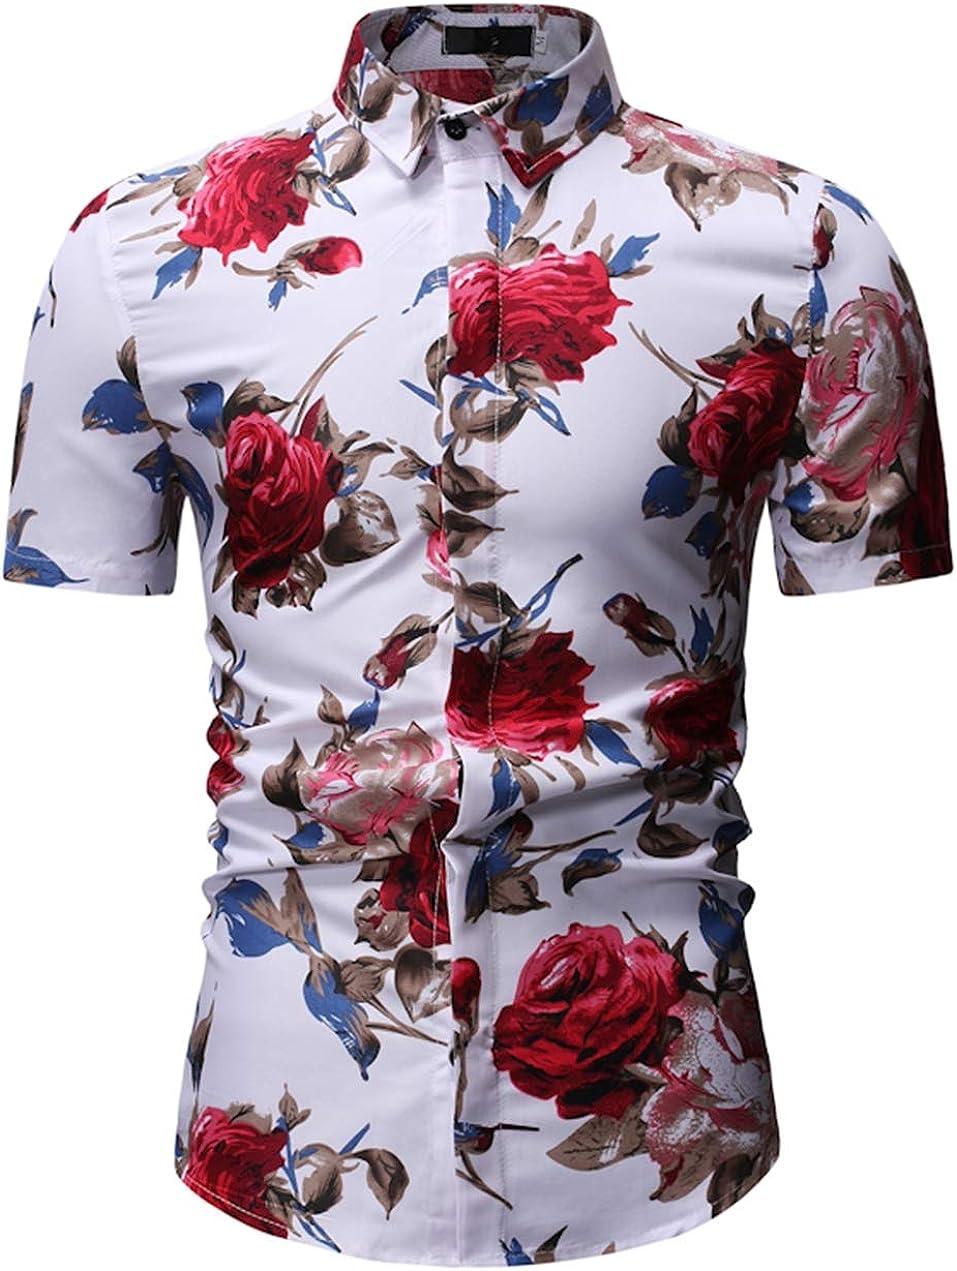 Men's Large Size Shirt Casual Lapel Slim Hawaiian Beach Print Shirt Shirt Simple and Versatile